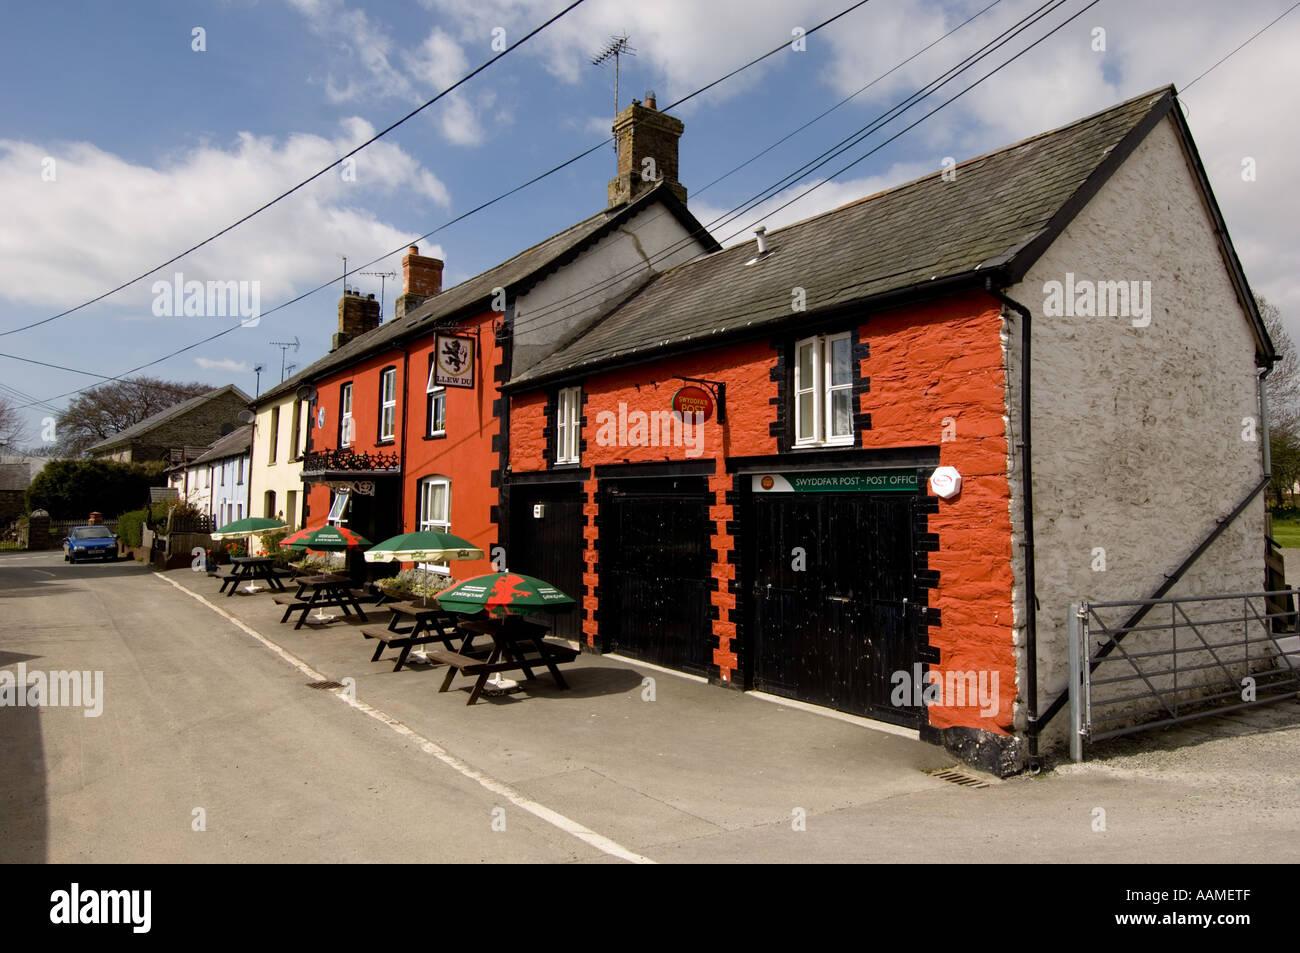 The Black Lion Hotel pub.Pontrhydfendigaid, ceredigion Mid Wales - Stock Image